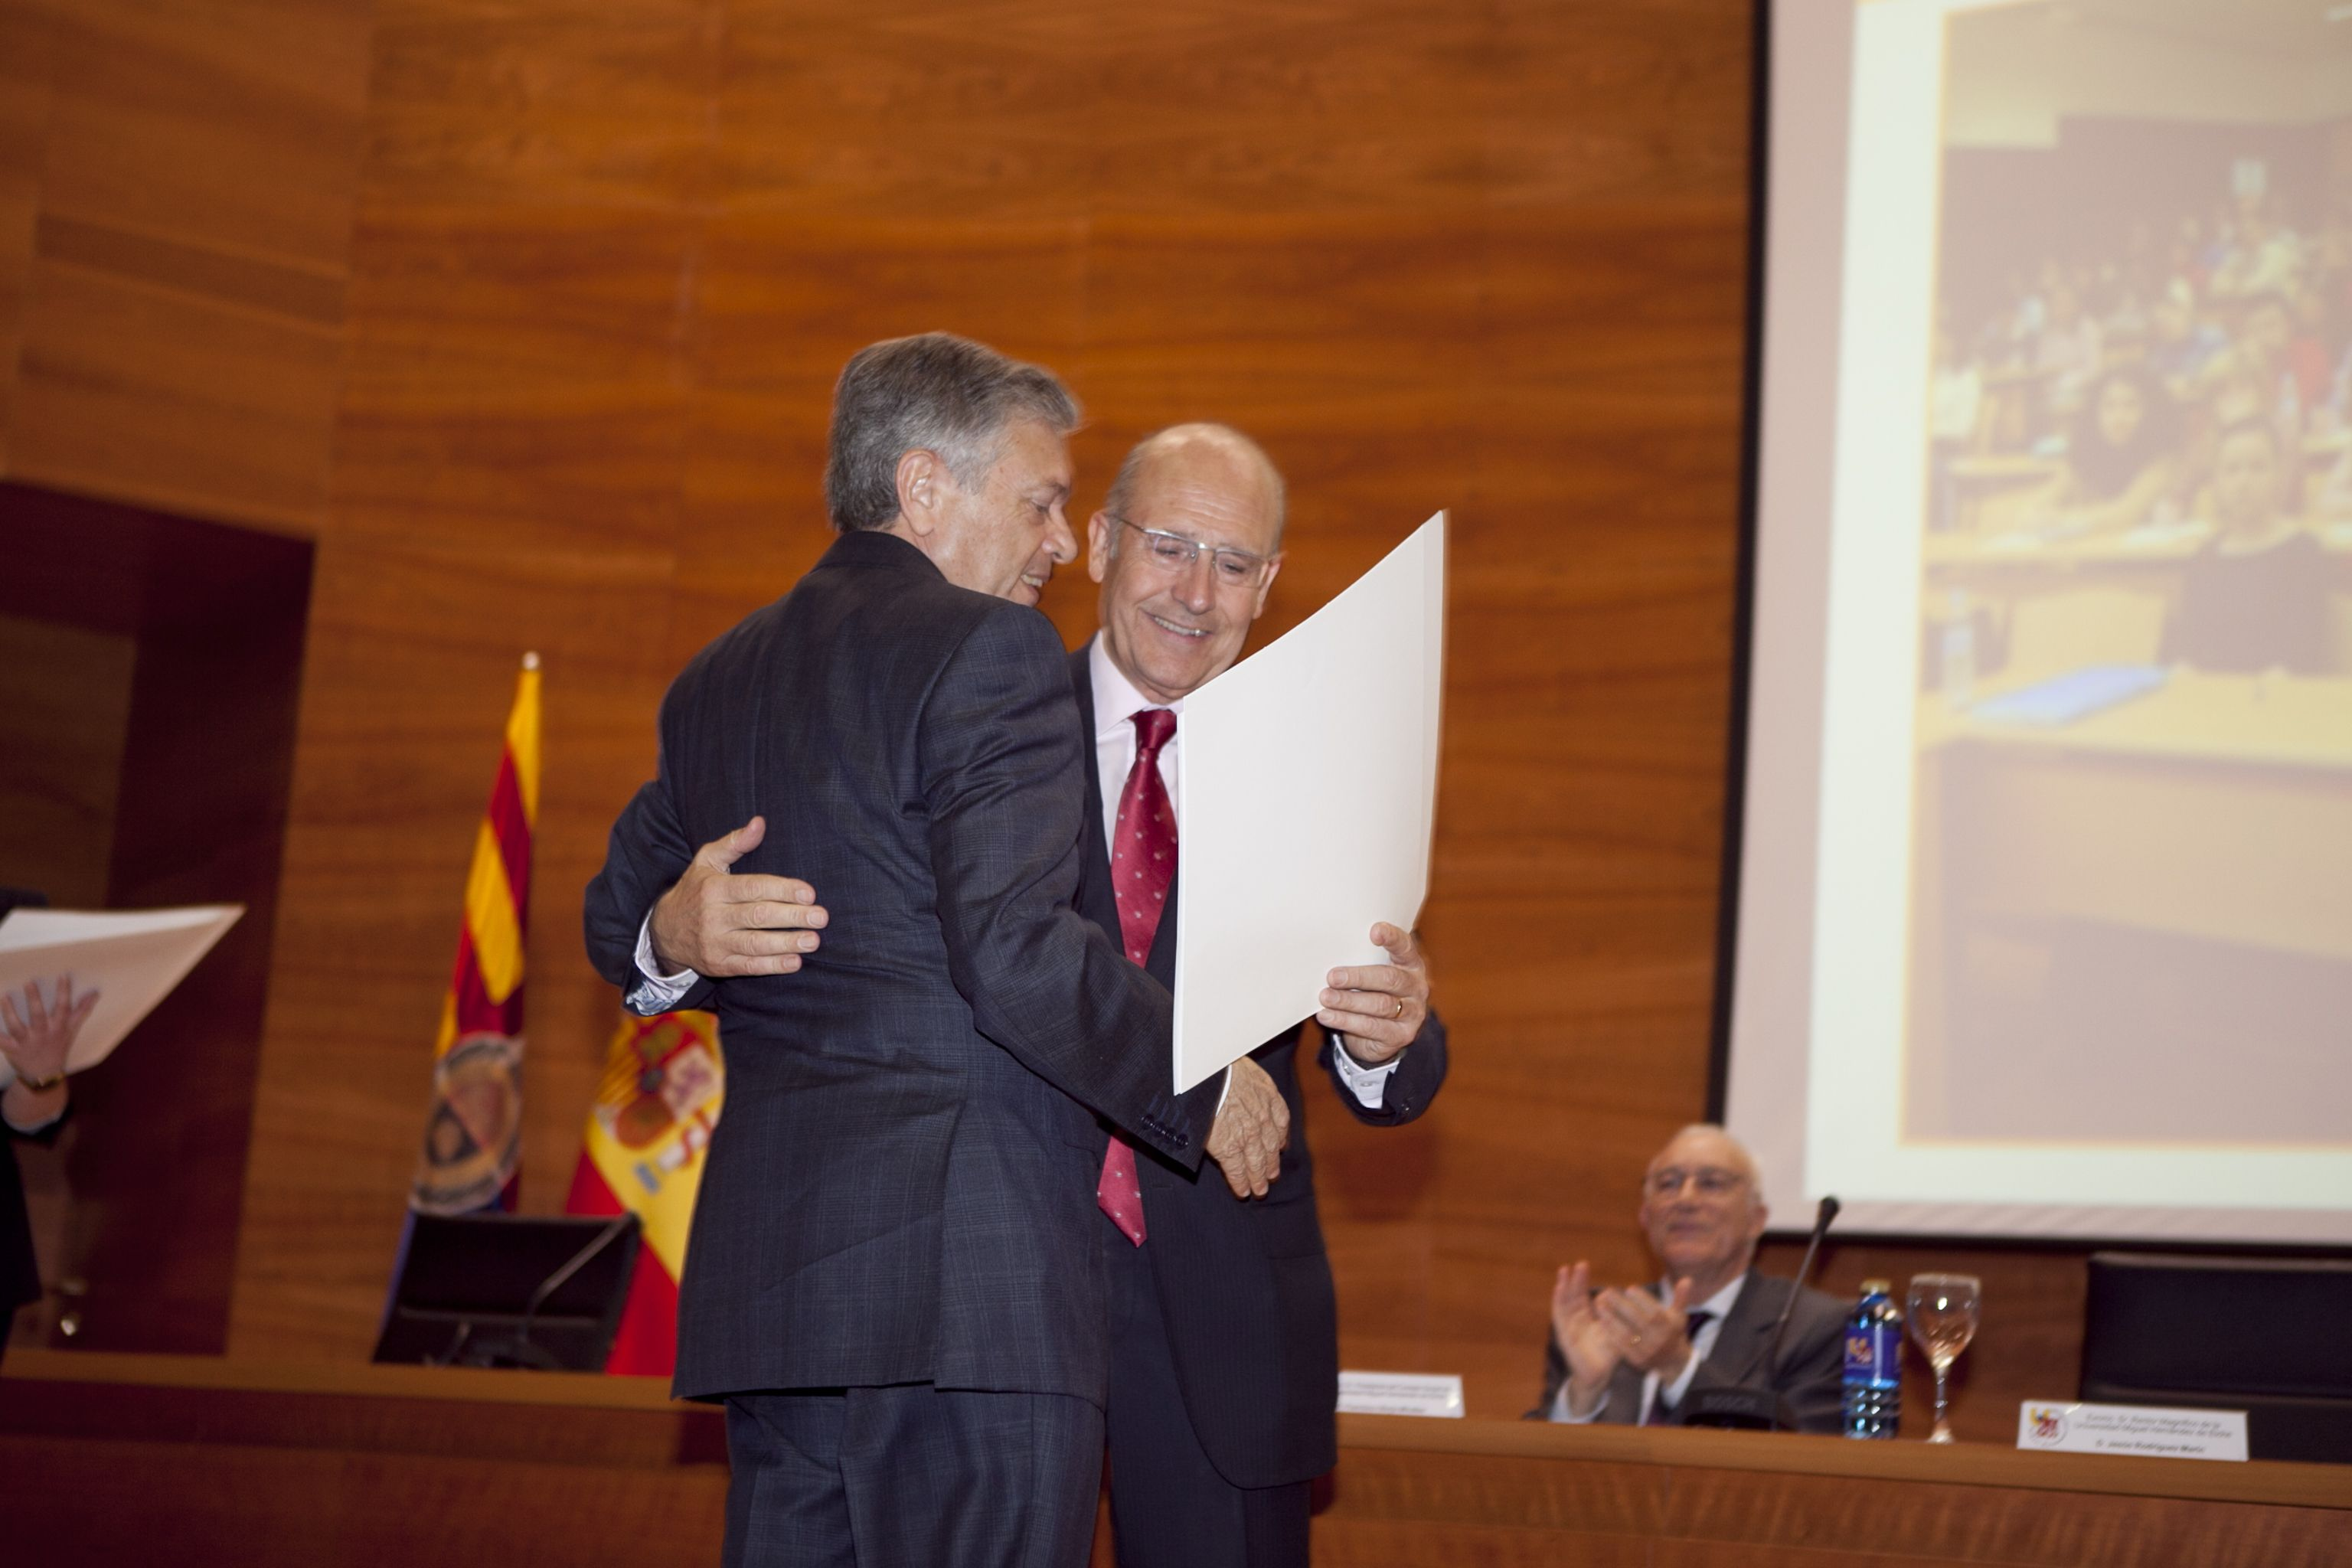 umh-diplomas-rector_mg_6512.jpg